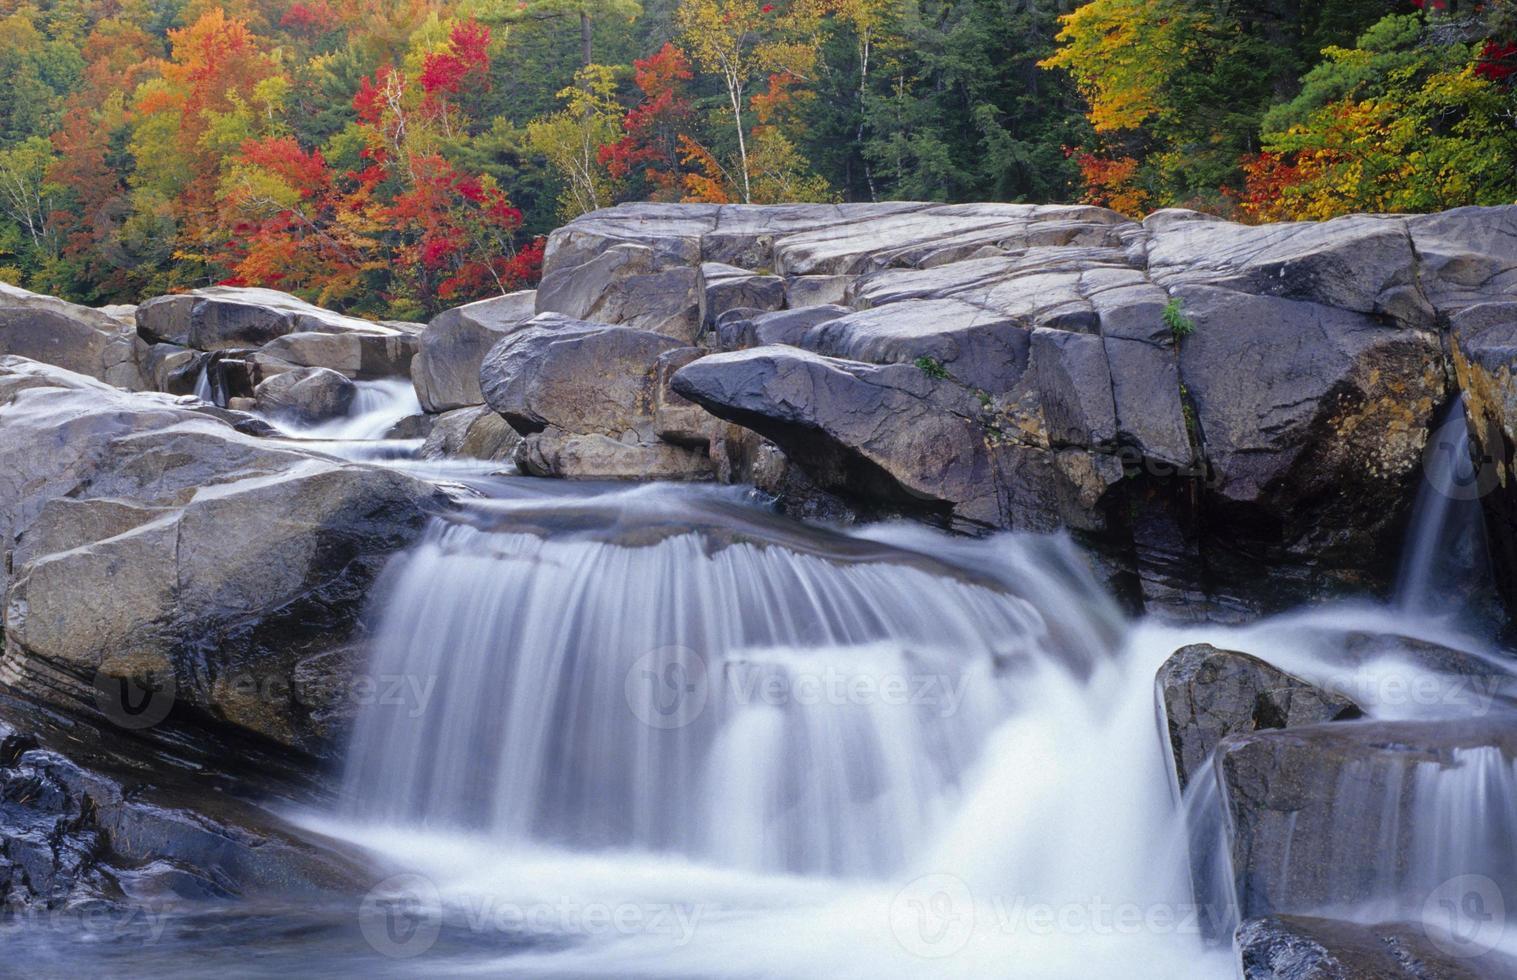 The Gorge, New Hampshire photo